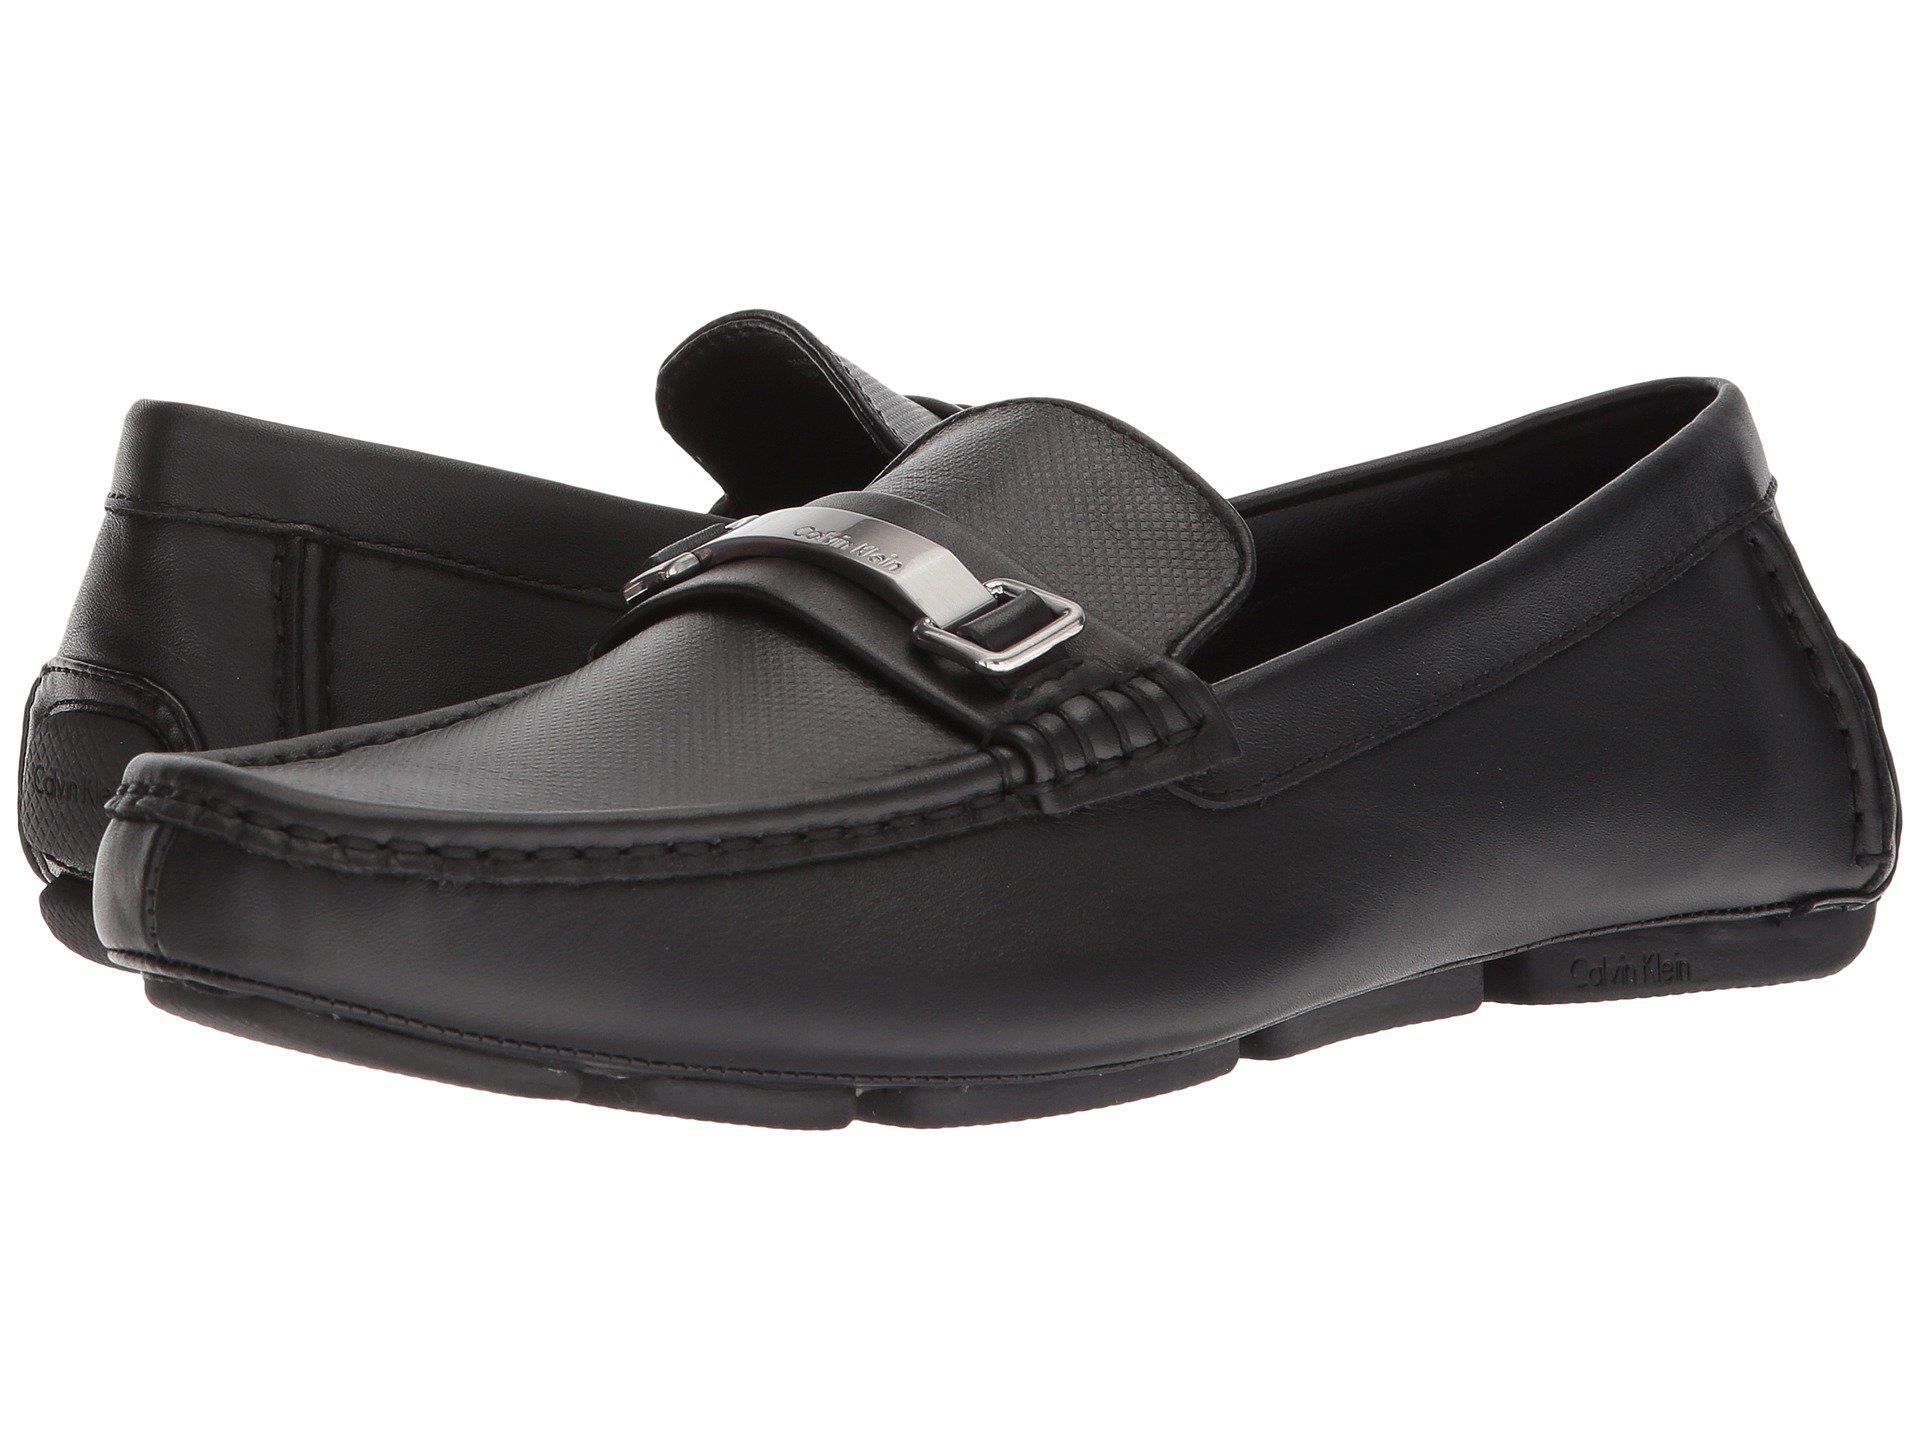 Maddix Black Nappa Calf Men'S Shoes Calvin Klein Maddix Shoes